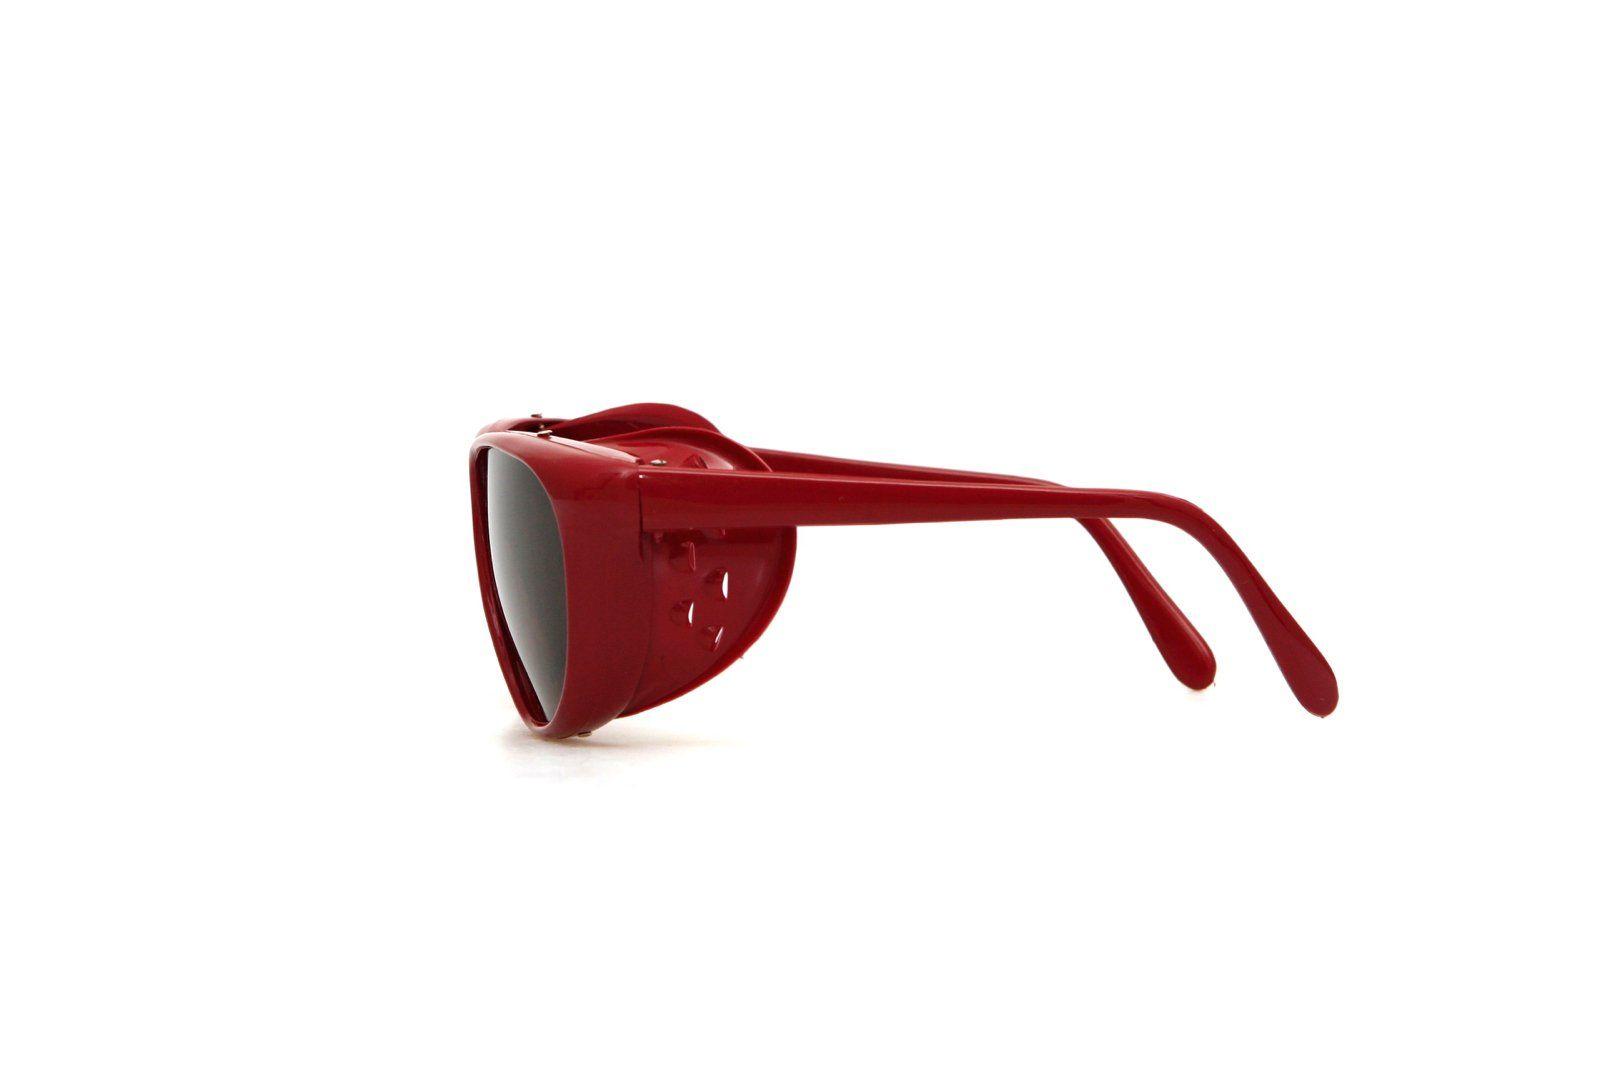 408759f79d5 Persol Ratti Aviator Sunglasses - Restaurant and Palinka Bar